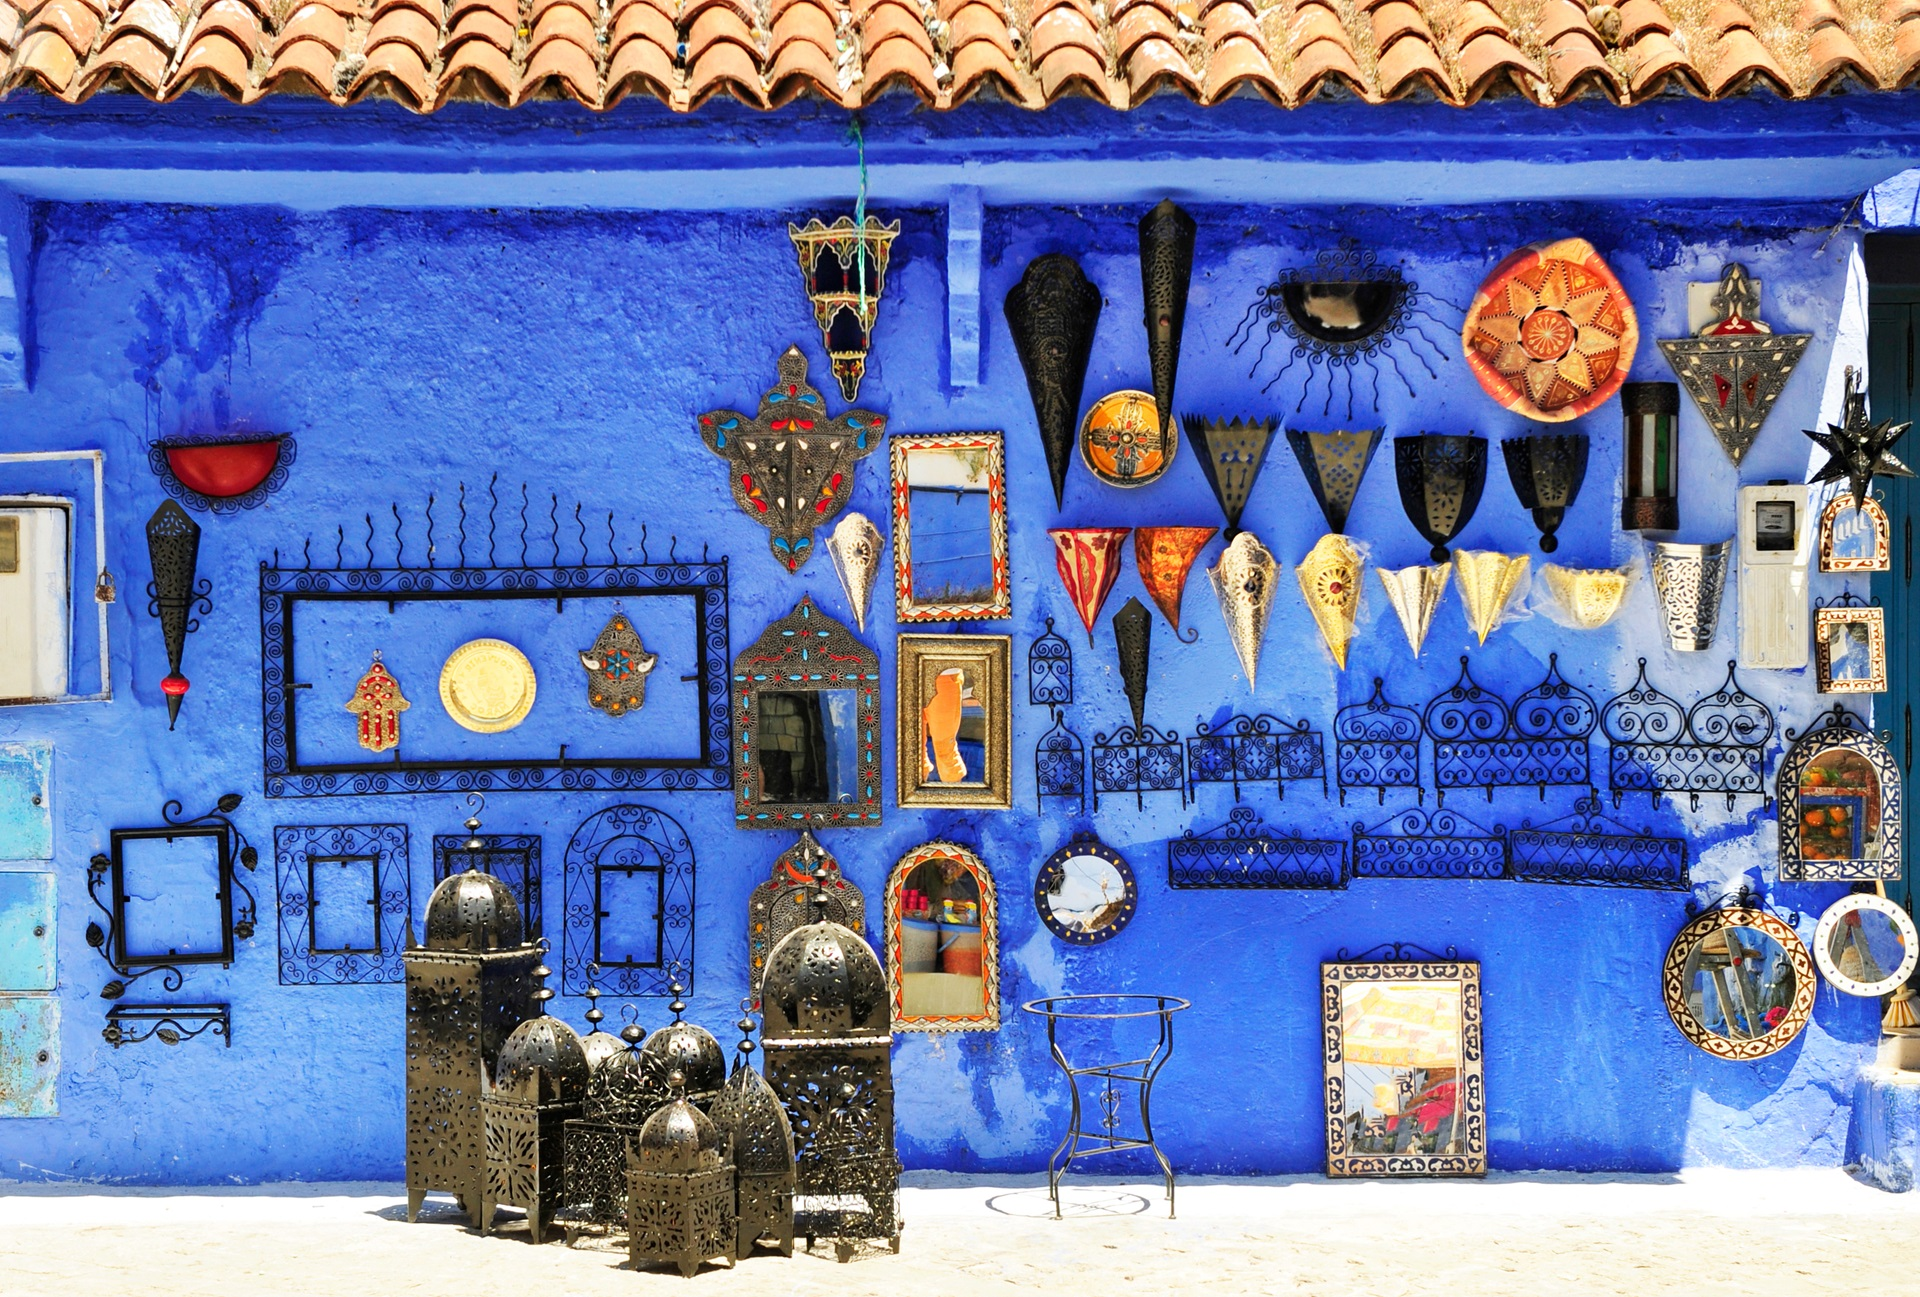 Explore Marrakesh